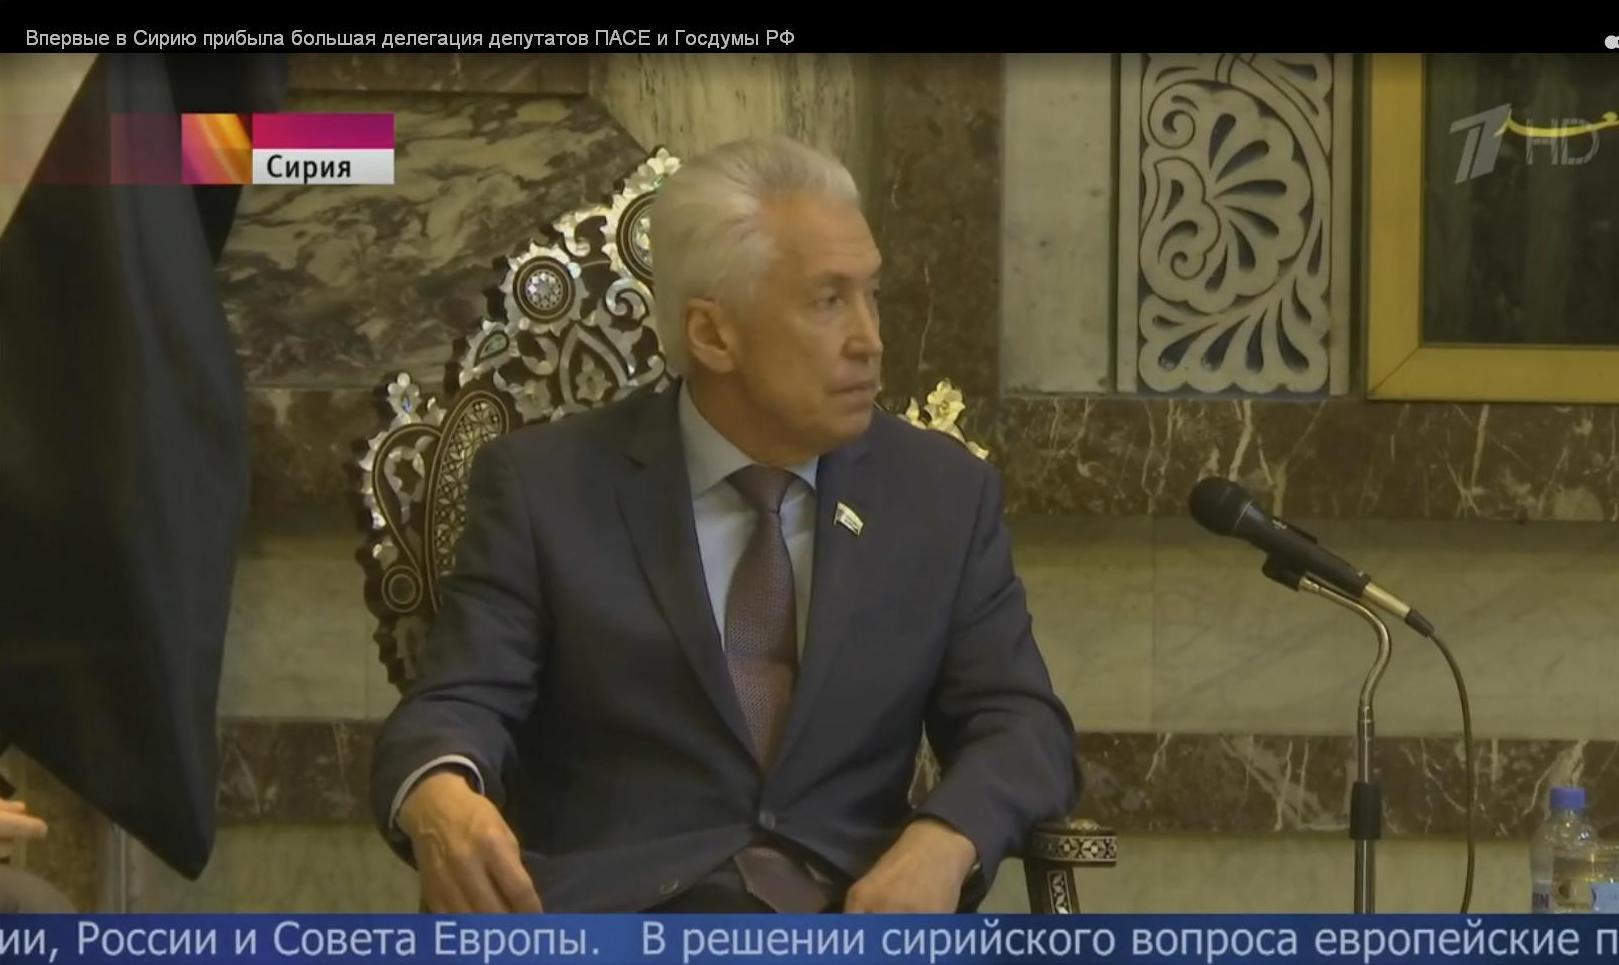 Украина требует отПАСЕ объяснений овизите депутатовРФ вСирию